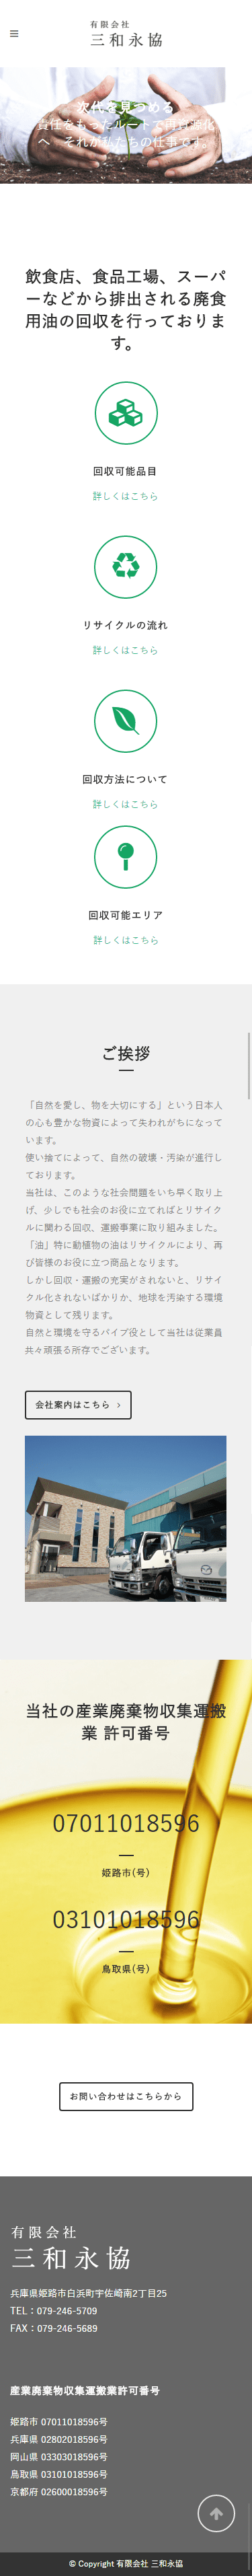 姫路市 有限会社三和永協様 ホームページ制作3